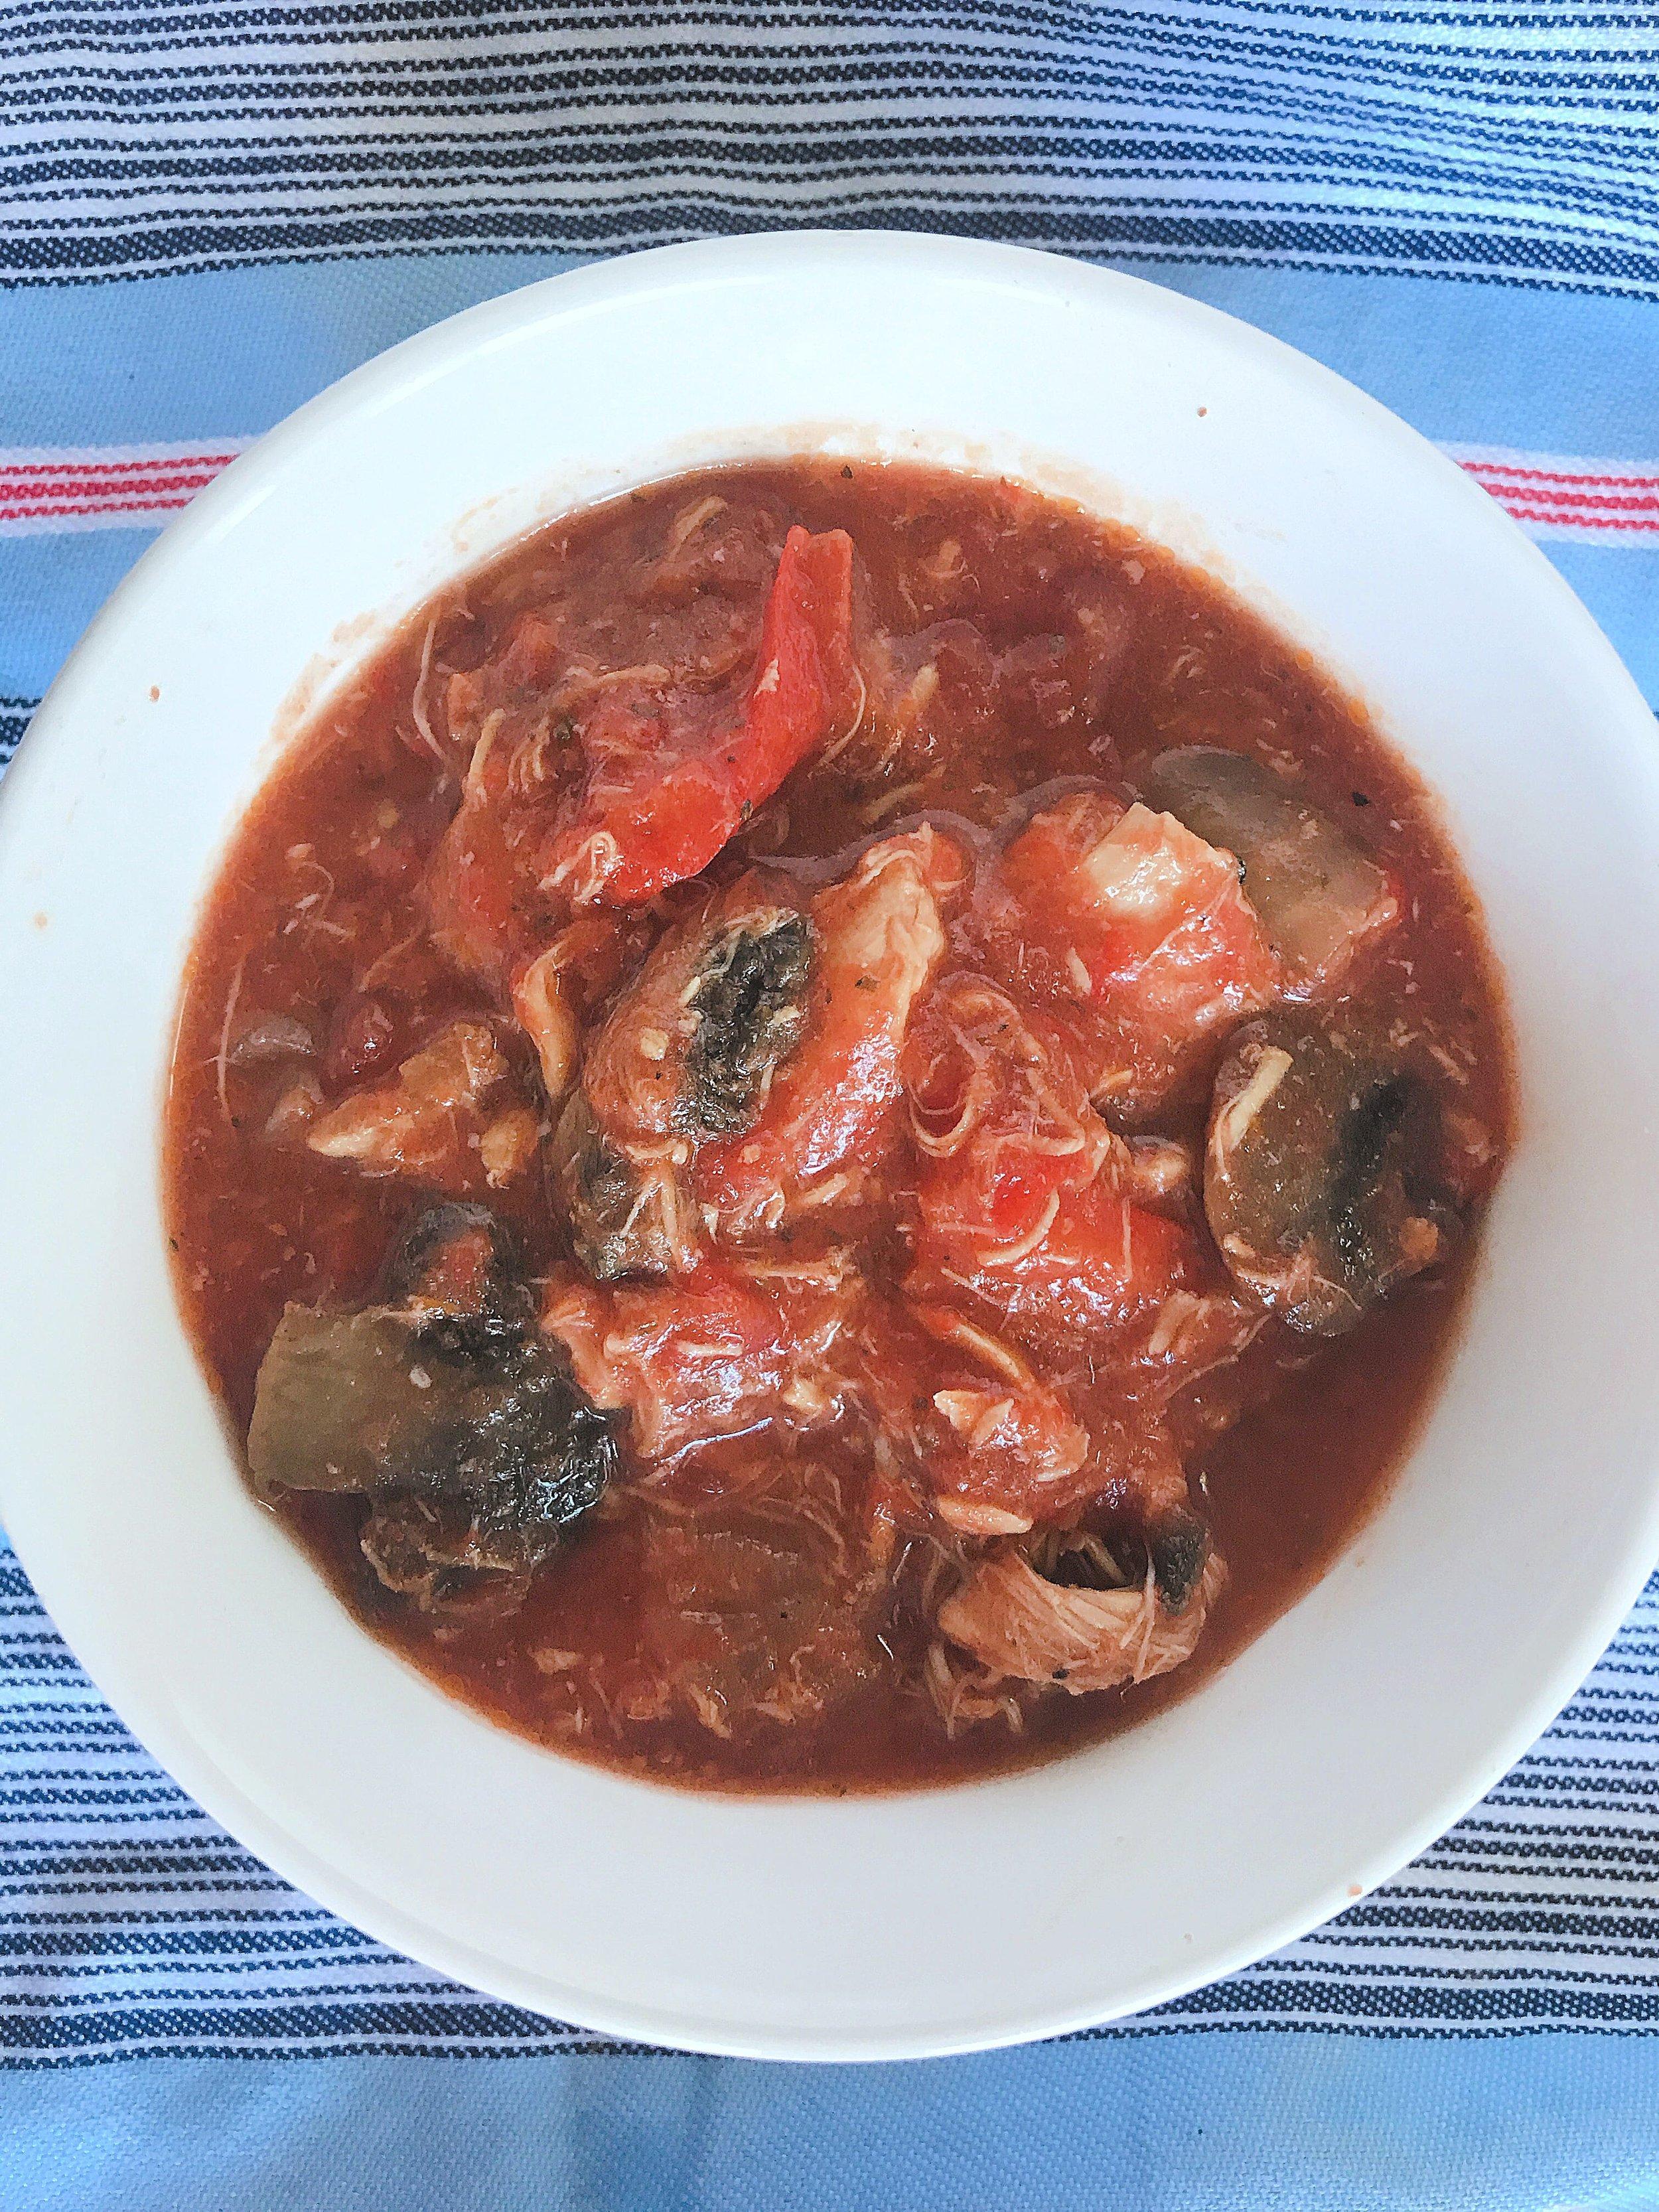 Keto Crockpot Chicken Cacciatore Stew